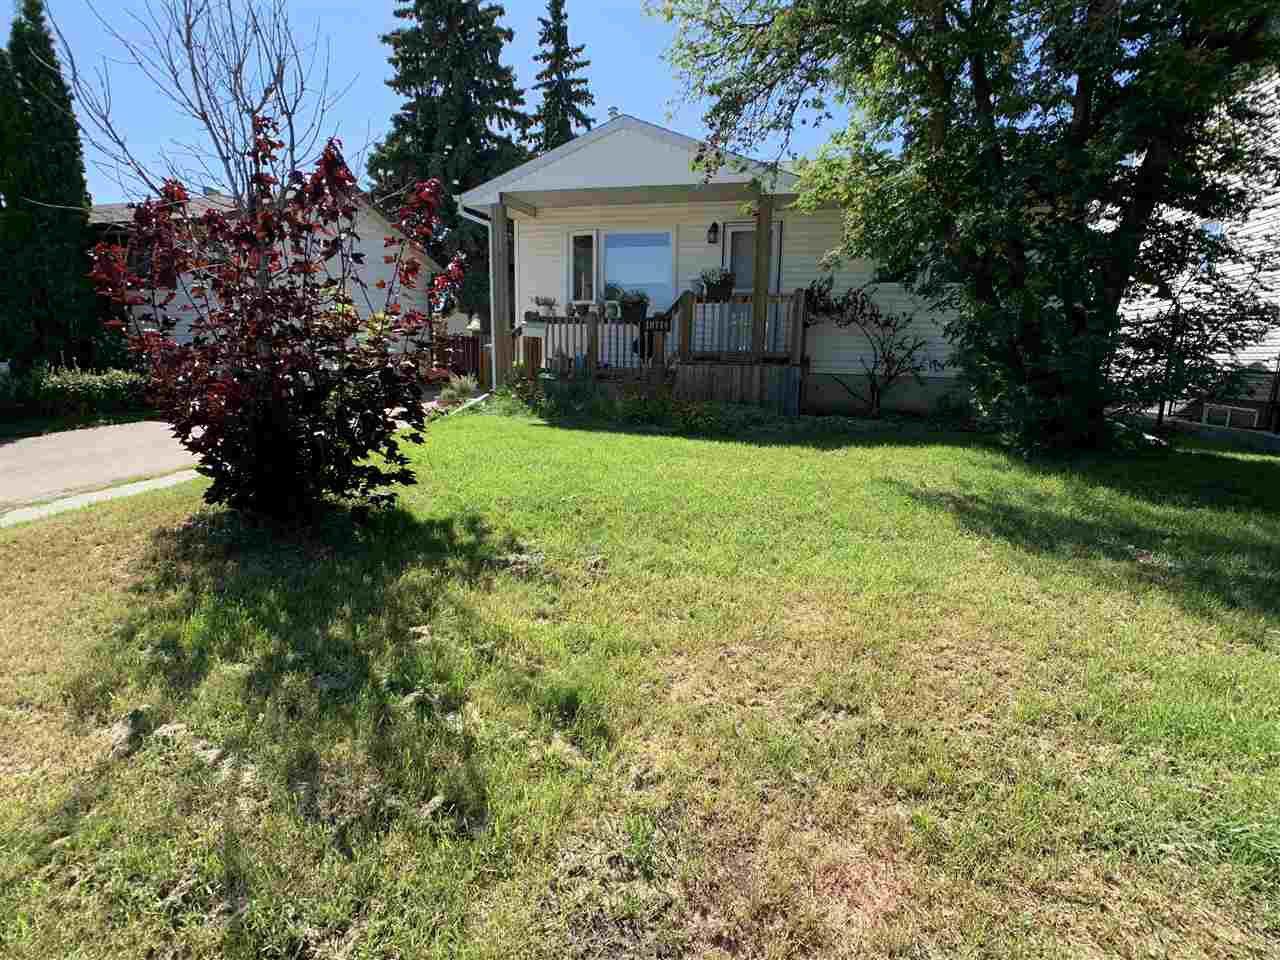 Main Photo: 10744 155 Street in Edmonton: Zone 21 House for sale : MLS®# E4209026